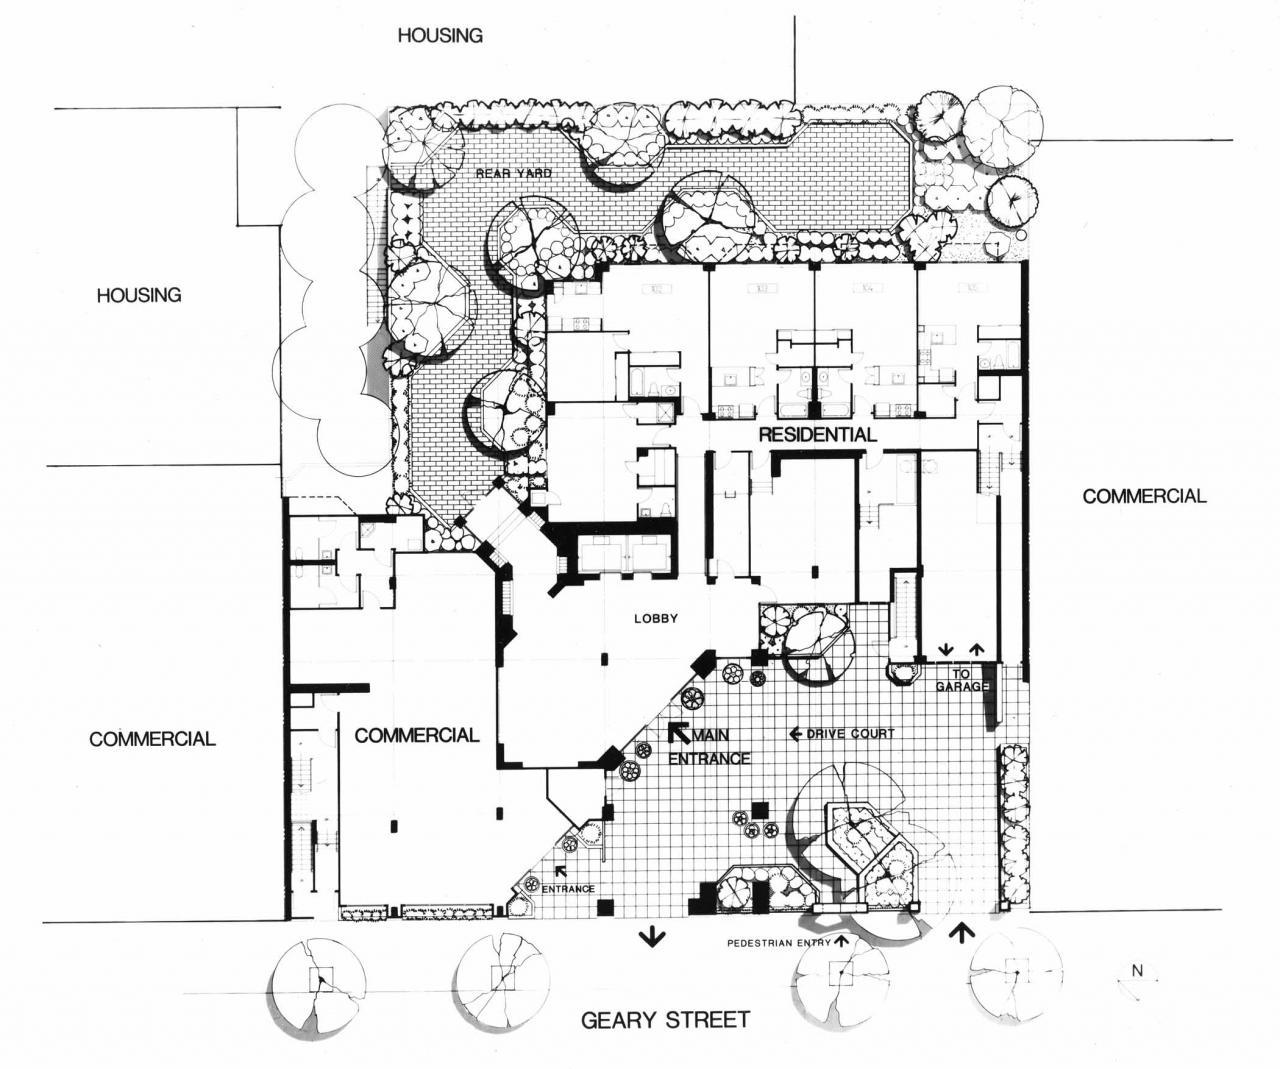 San Francisco Apartments For Rent By Owner: Cervantes Design Associates, Inc.